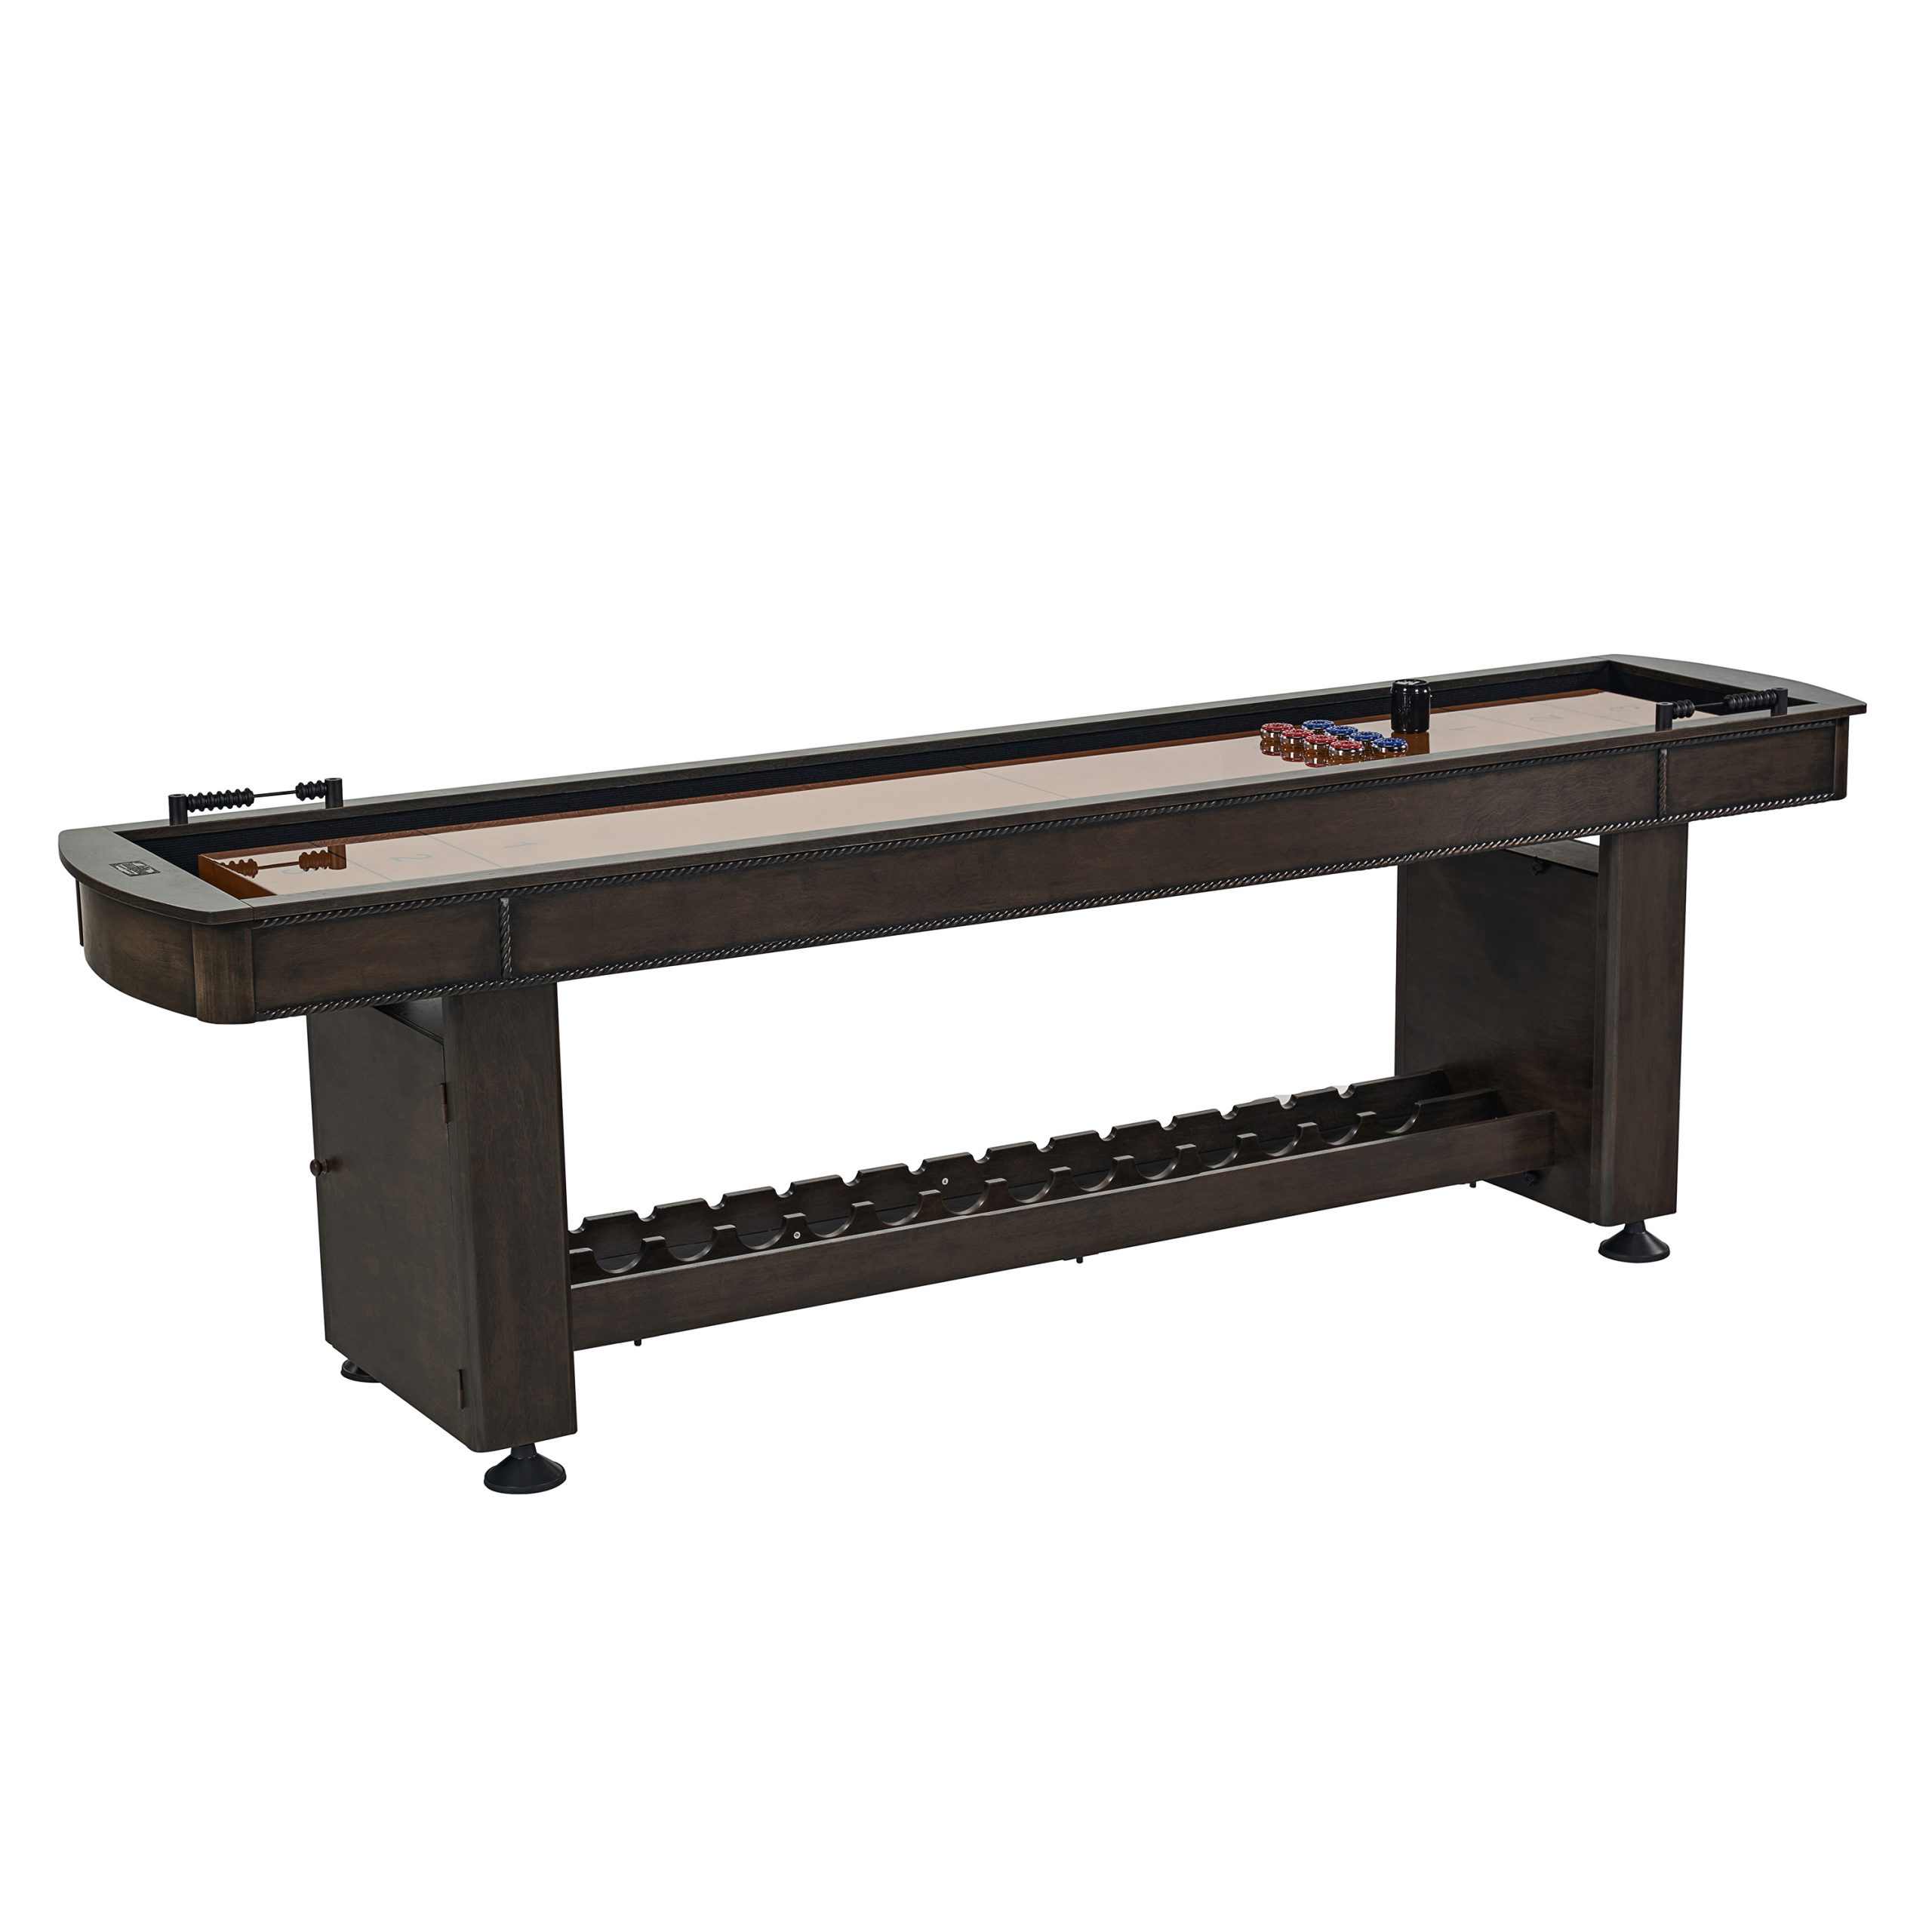 traditional shuffleboard table